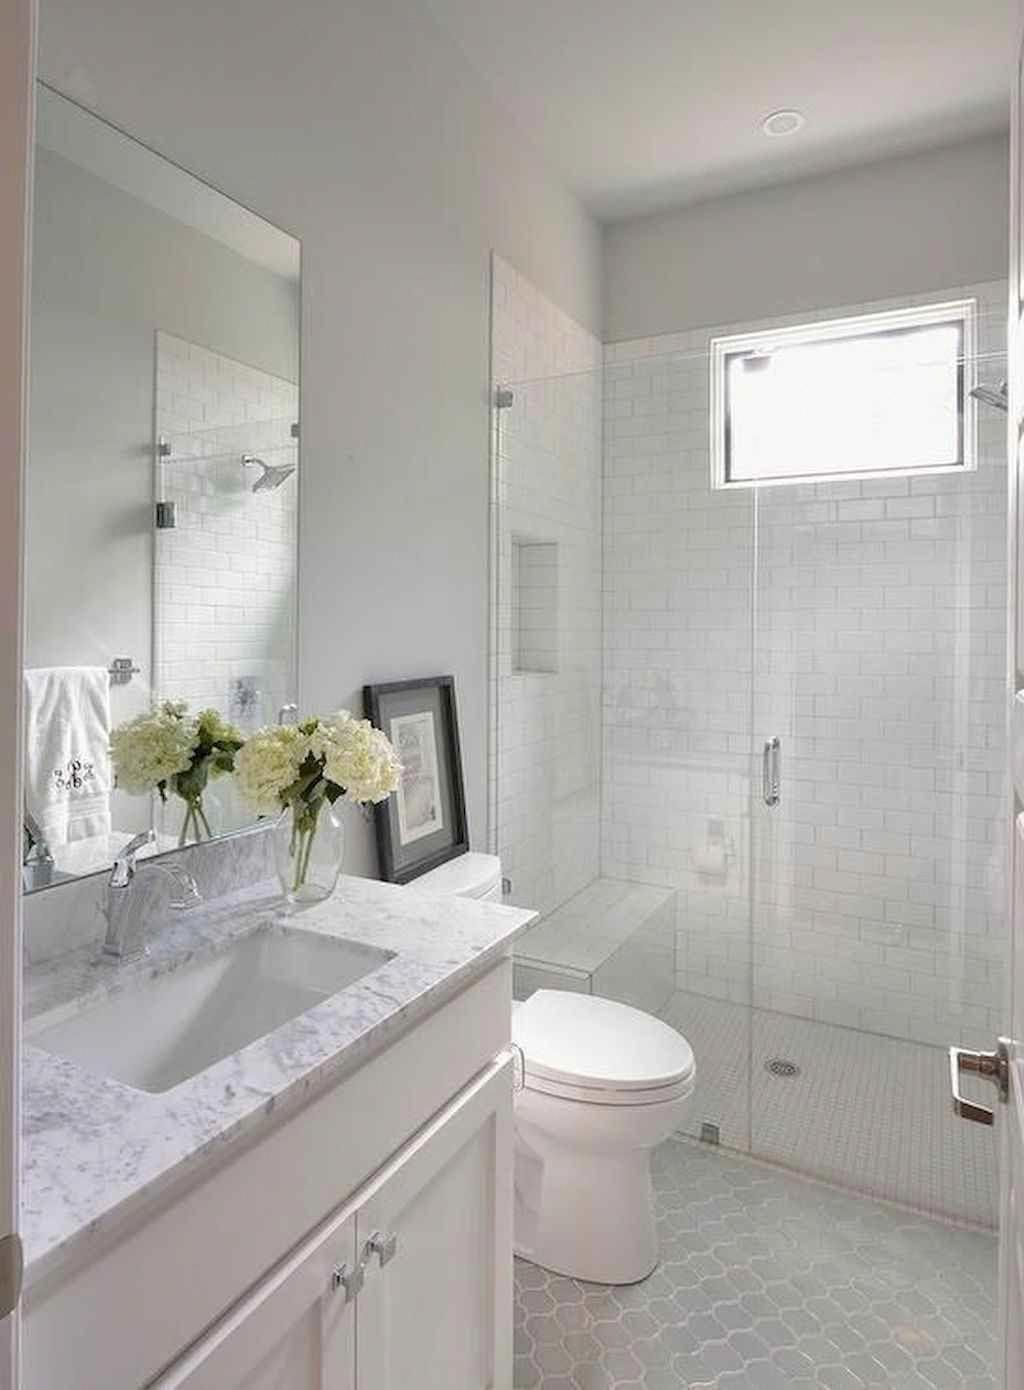 65 Beautiful Bathroom Shower Remodel Ideas In 2020 Small Bathroom Makeover Small Bathroom Bathrooms Remodel